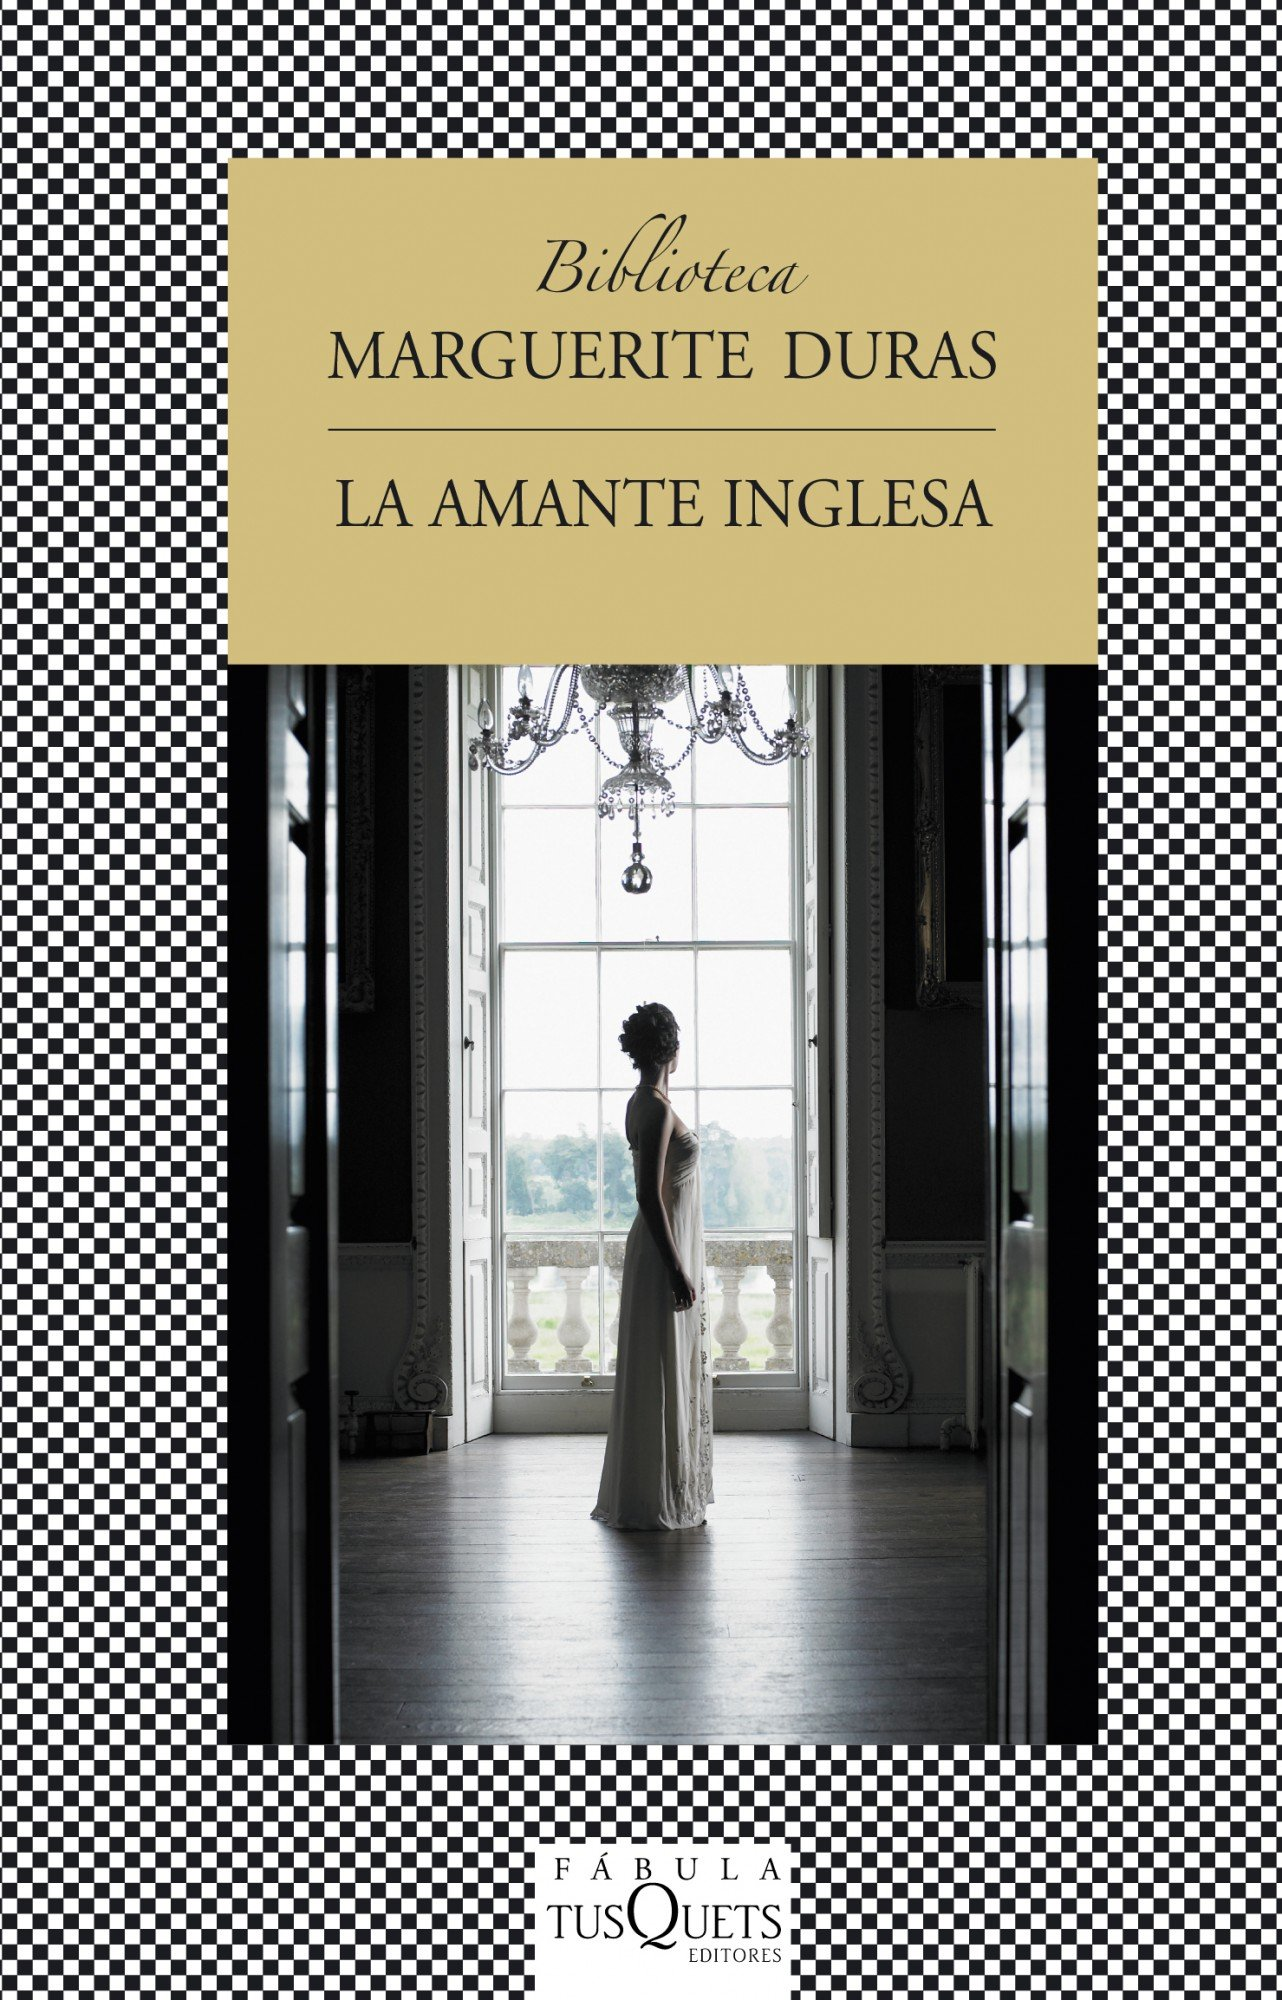 Amazon.com: La amante inglesa (Biblioteca De Marguerite Duras / Marguerite Duras Library) (Spanish Edition) (9788483833100): Marguerite Duras: Books